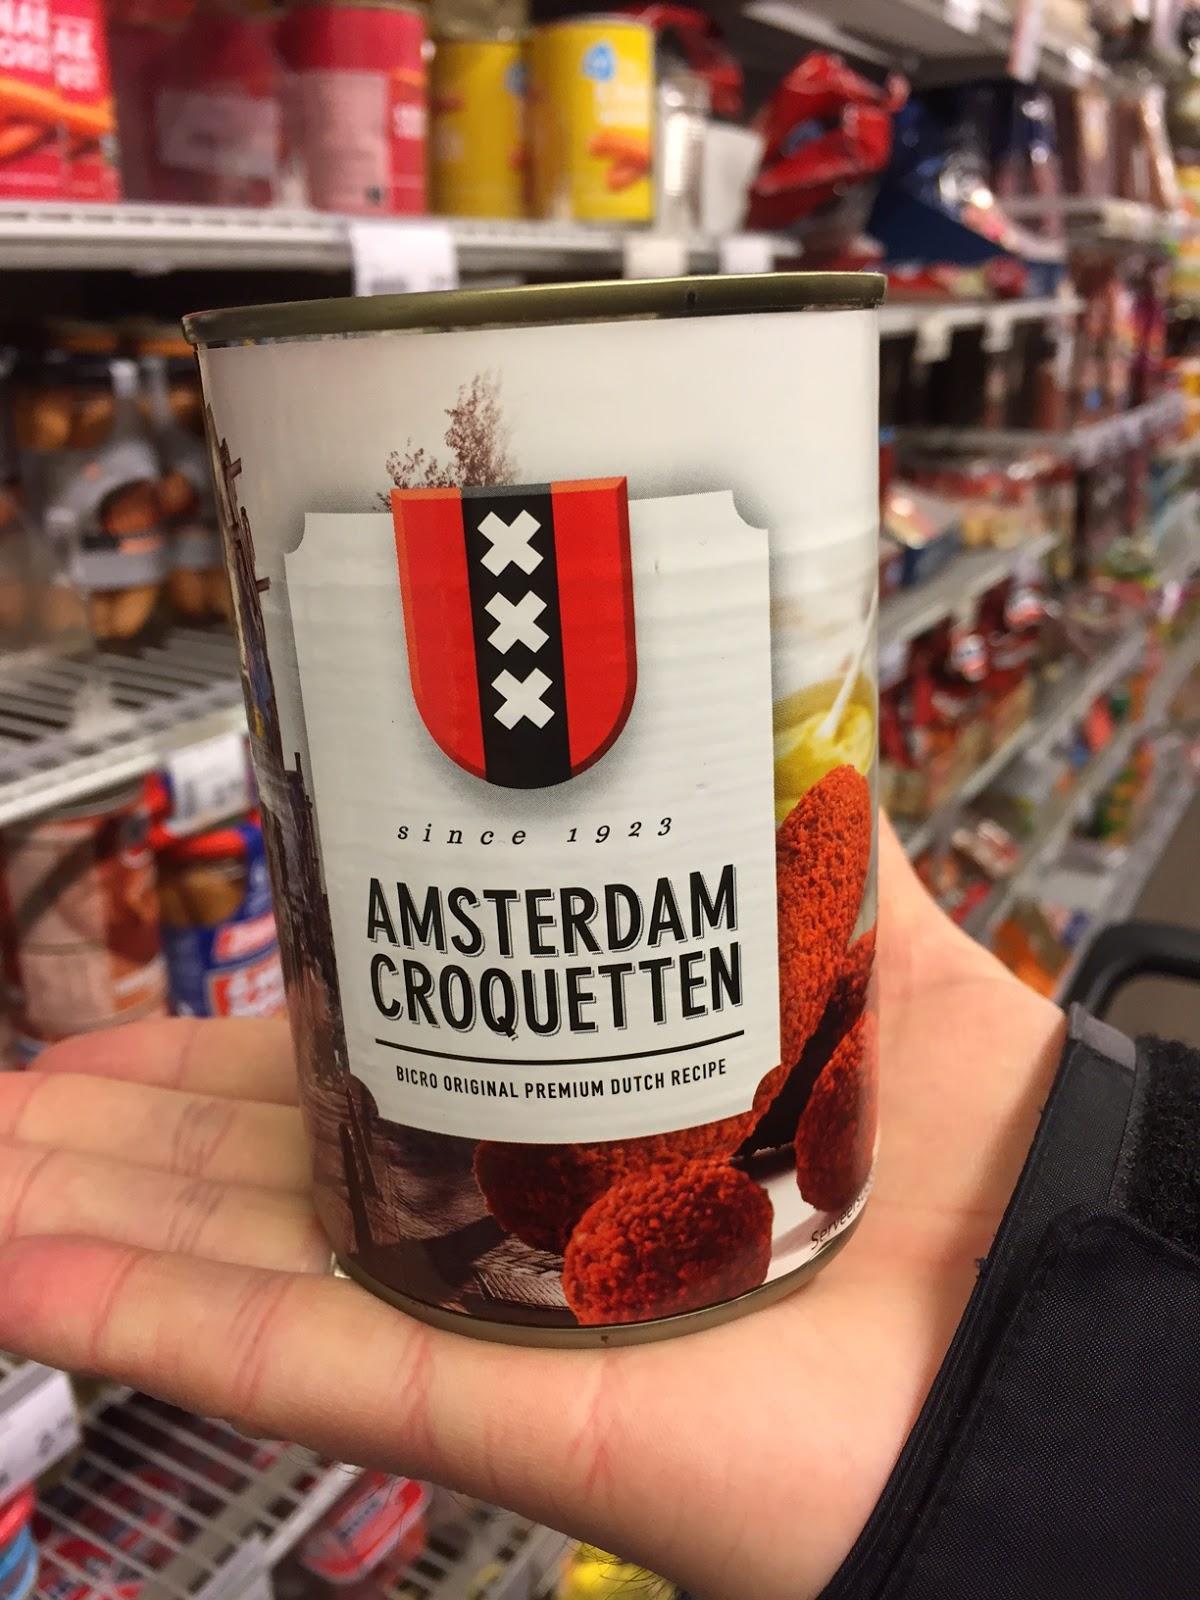 co jedzą Holendrzy croquetten